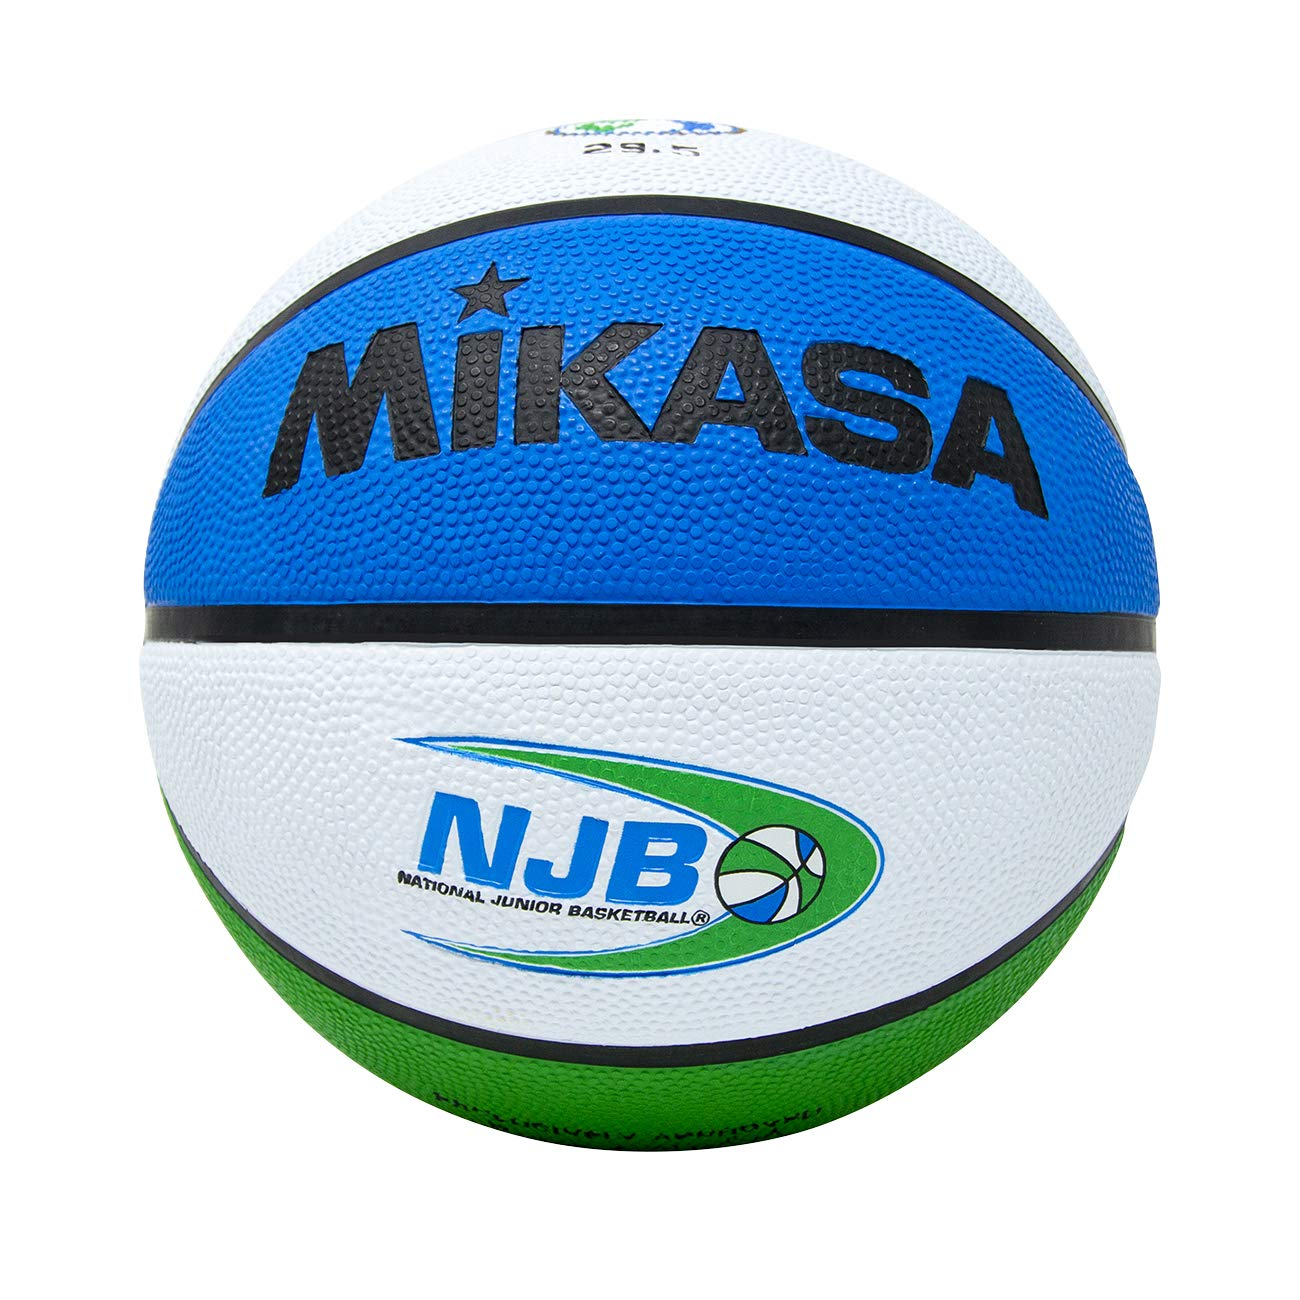 Mikasa Nacional de Baloncesto Juego Oficial Infantil con Cubierta ...